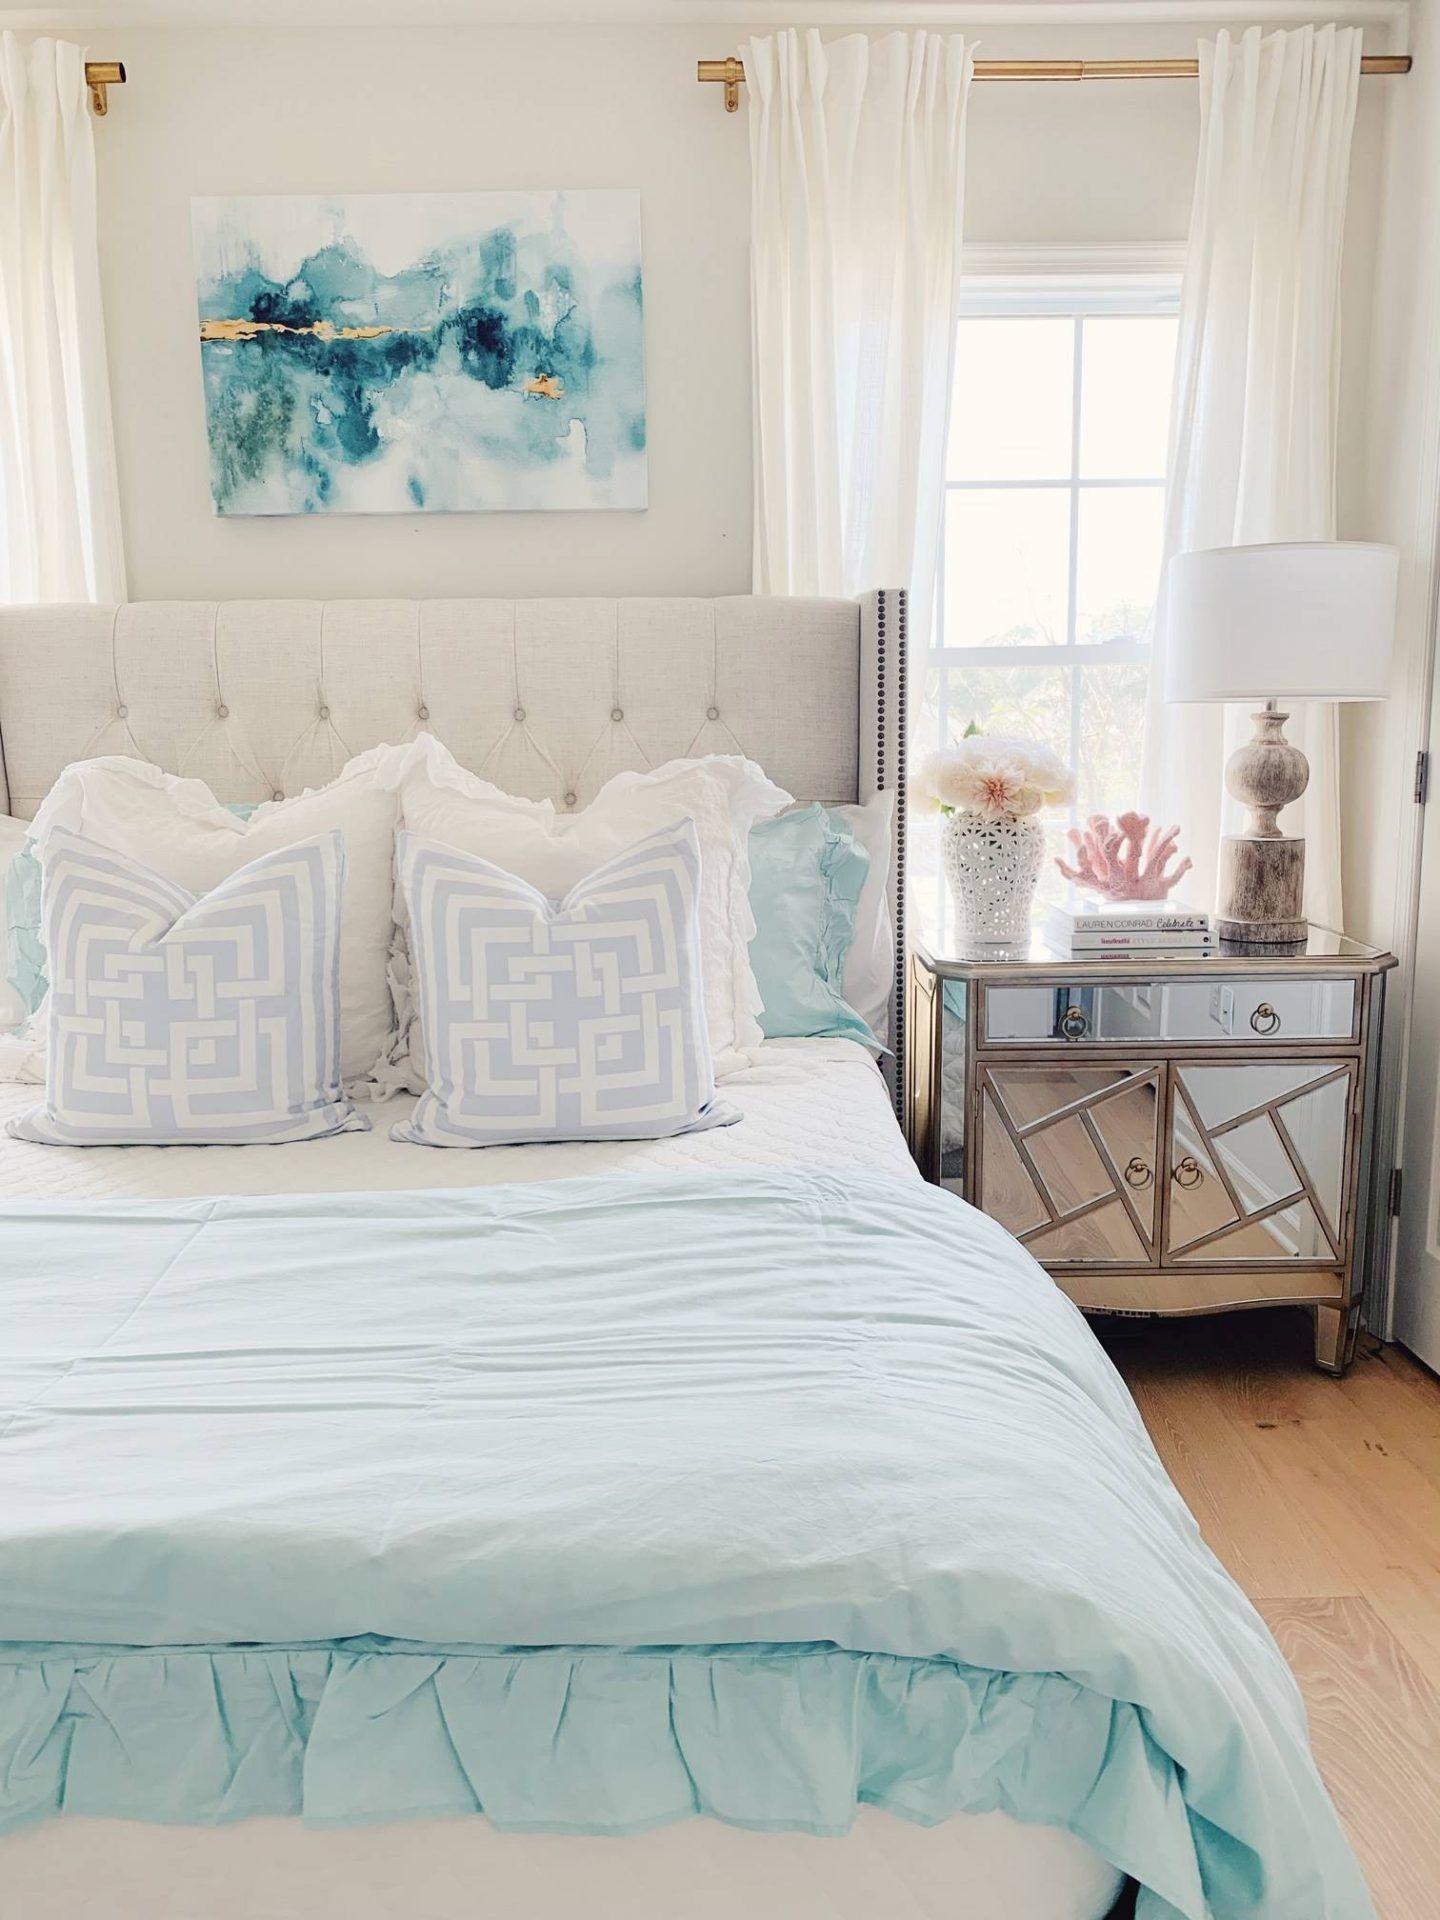 Coastal Inspired Bedroom Ideas With Walmart The Pink Dream Beach Bedroom Decor Coastal Bedroom Decorating Beach House Bedroom Furniture